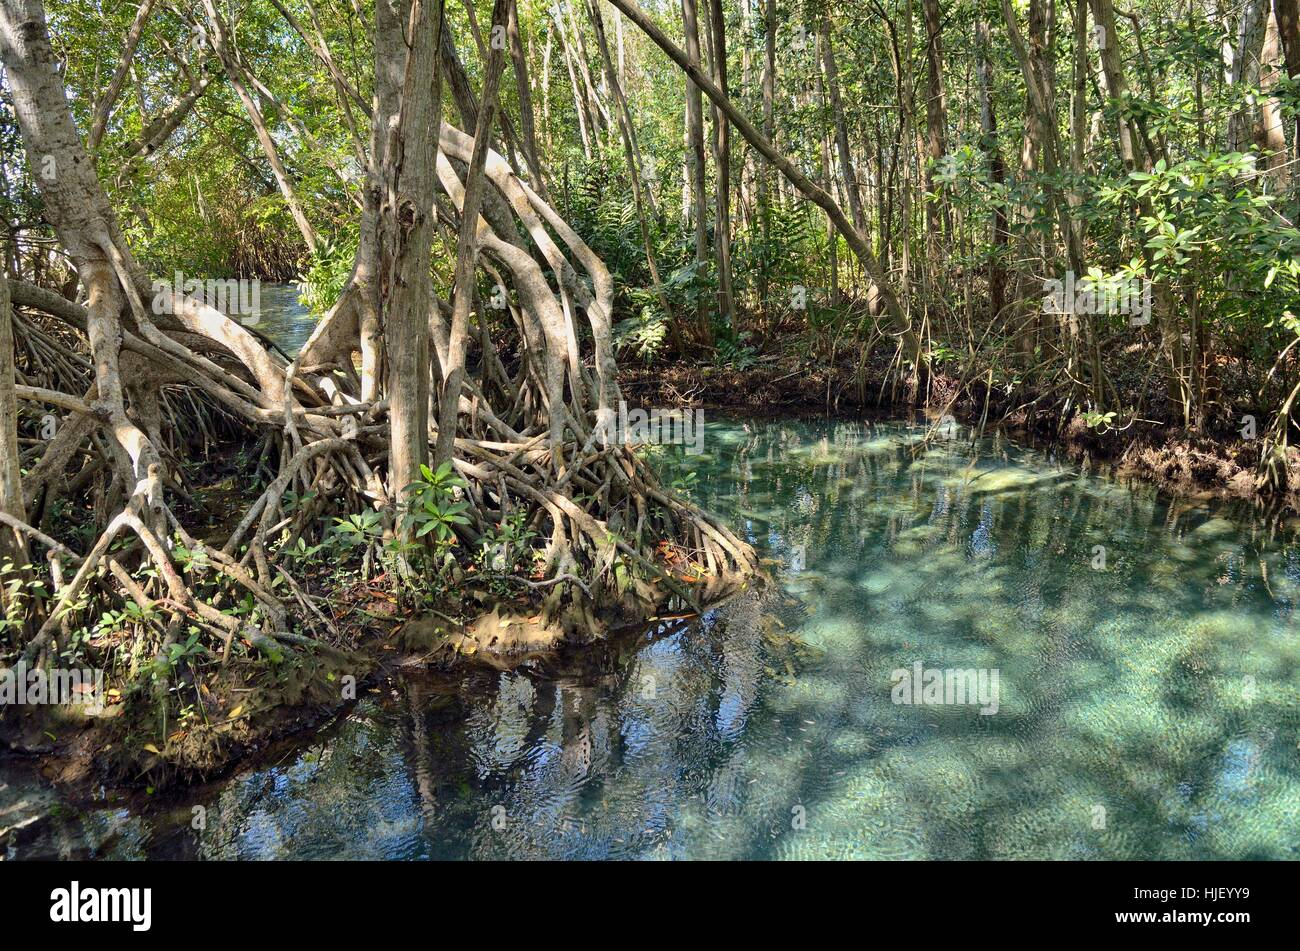 Freshwater source in mangrove forest (Rhizophora), near Celestun, Yucatan, Mexico - Stock Image